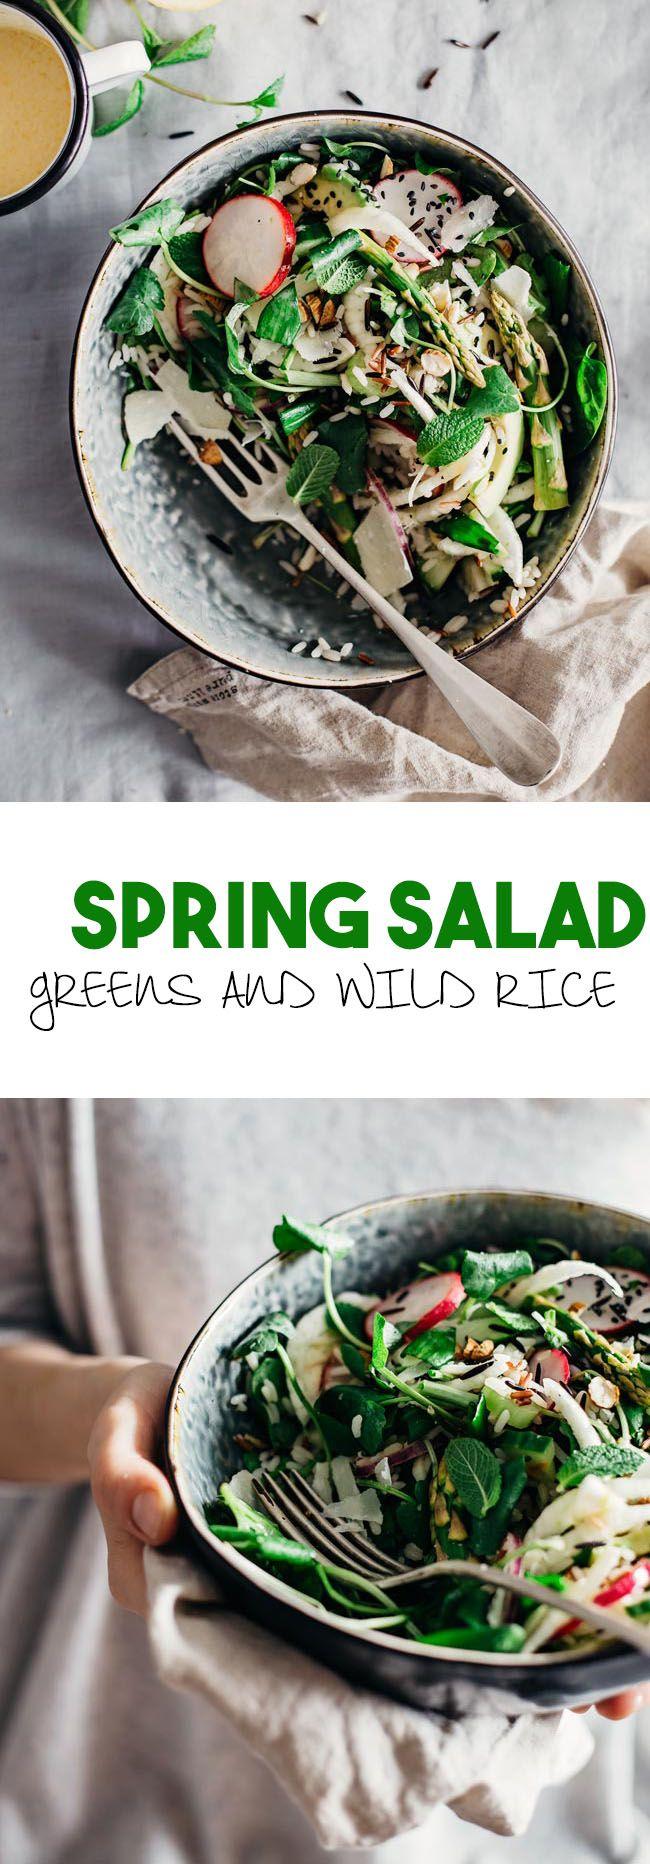 Spring Gratitude Salad, with greens, crunchy veggies and wild rice # ...